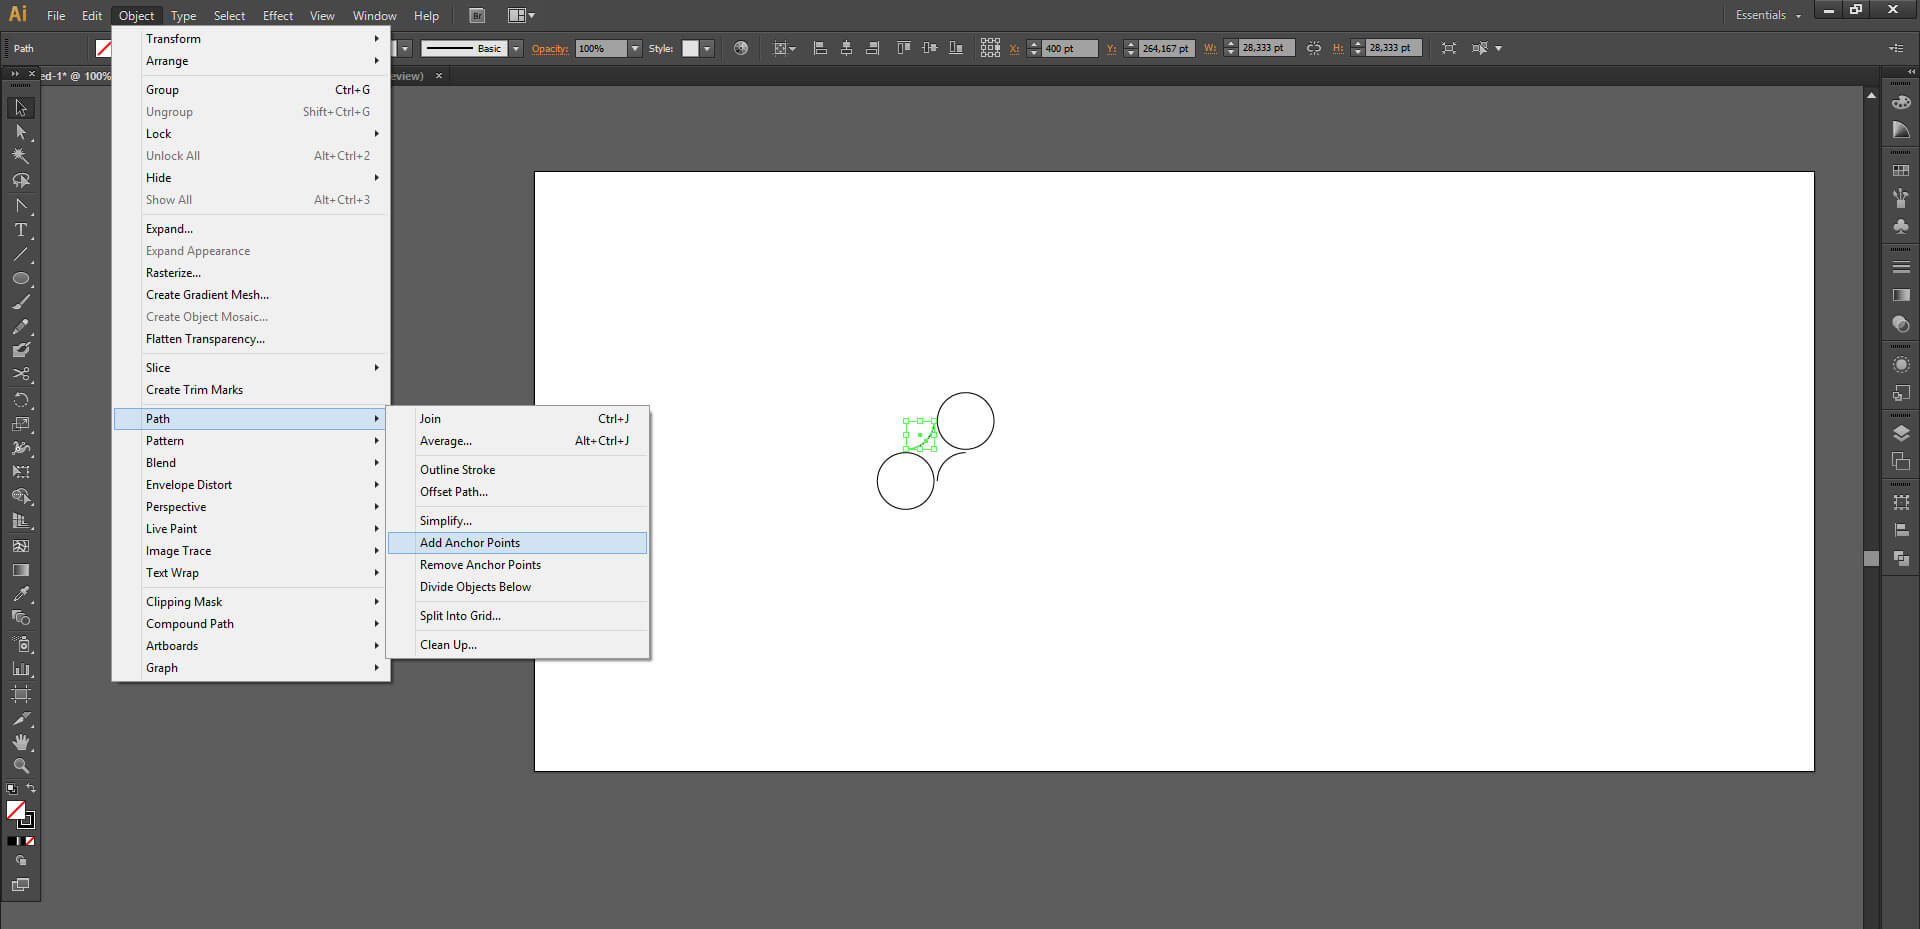 Illustrator'da Organik Teknoloji Simgesi